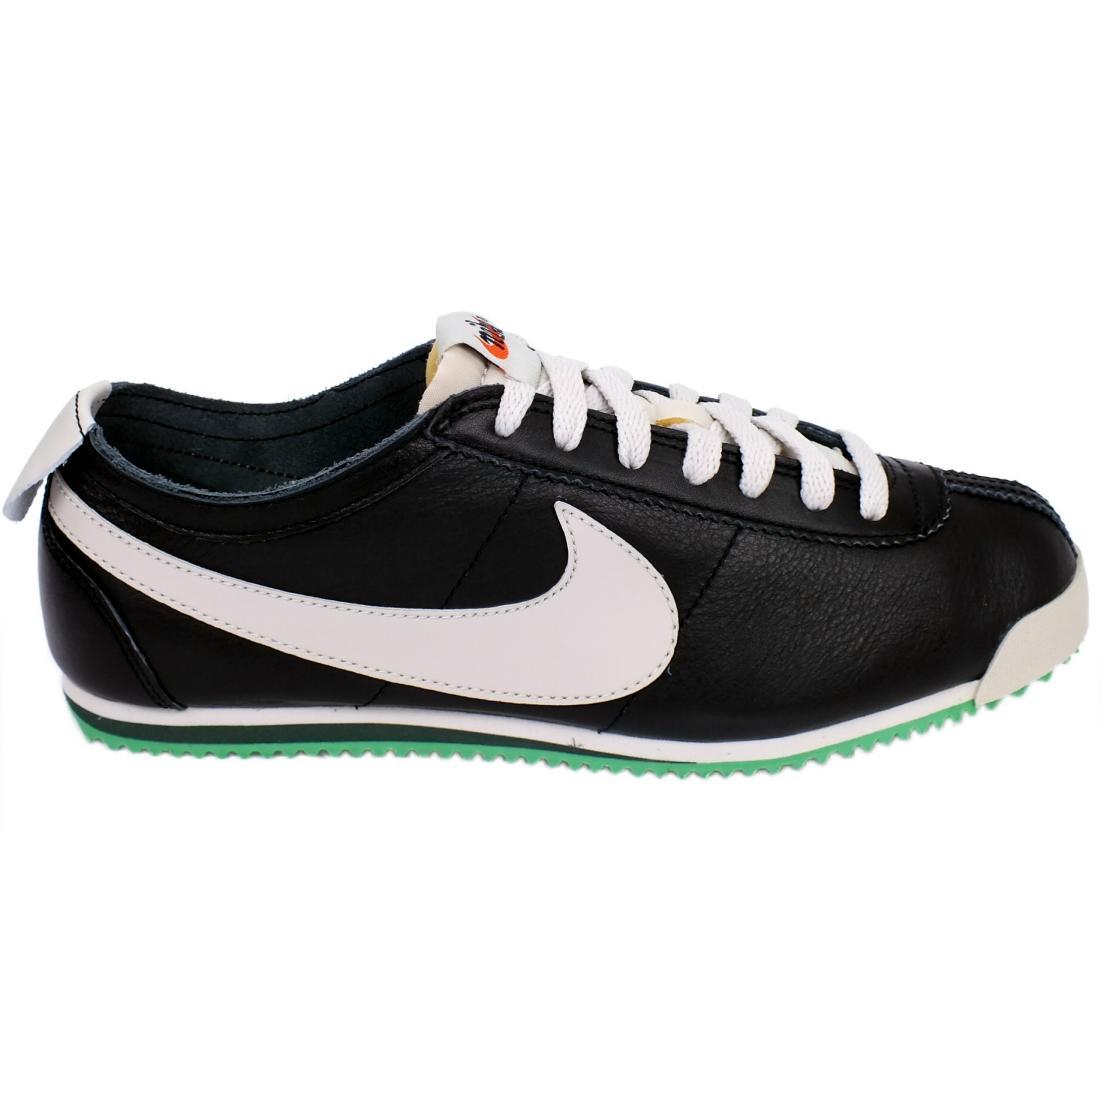 Nike Cortez Bronze Ebay